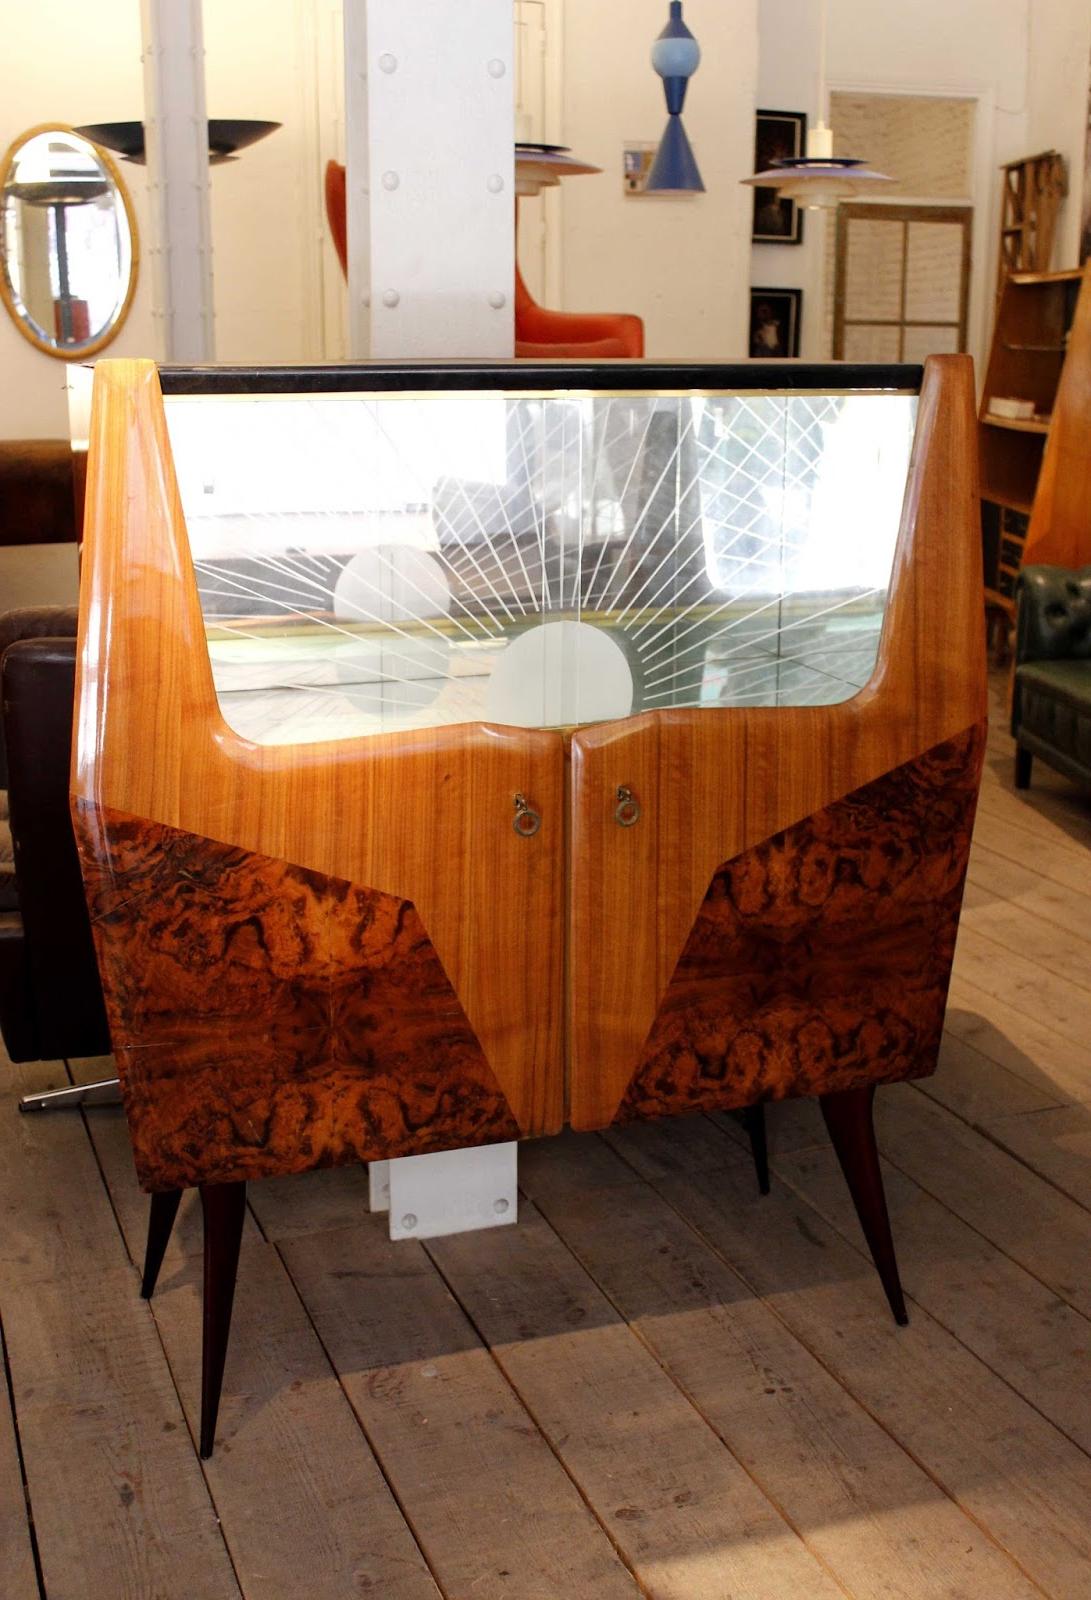 Muebles Rusticos Baratos Segunda Mano 9fdy Muebles Rusticos tonala Jalisco Para Banos Pequenos Sala Modernos